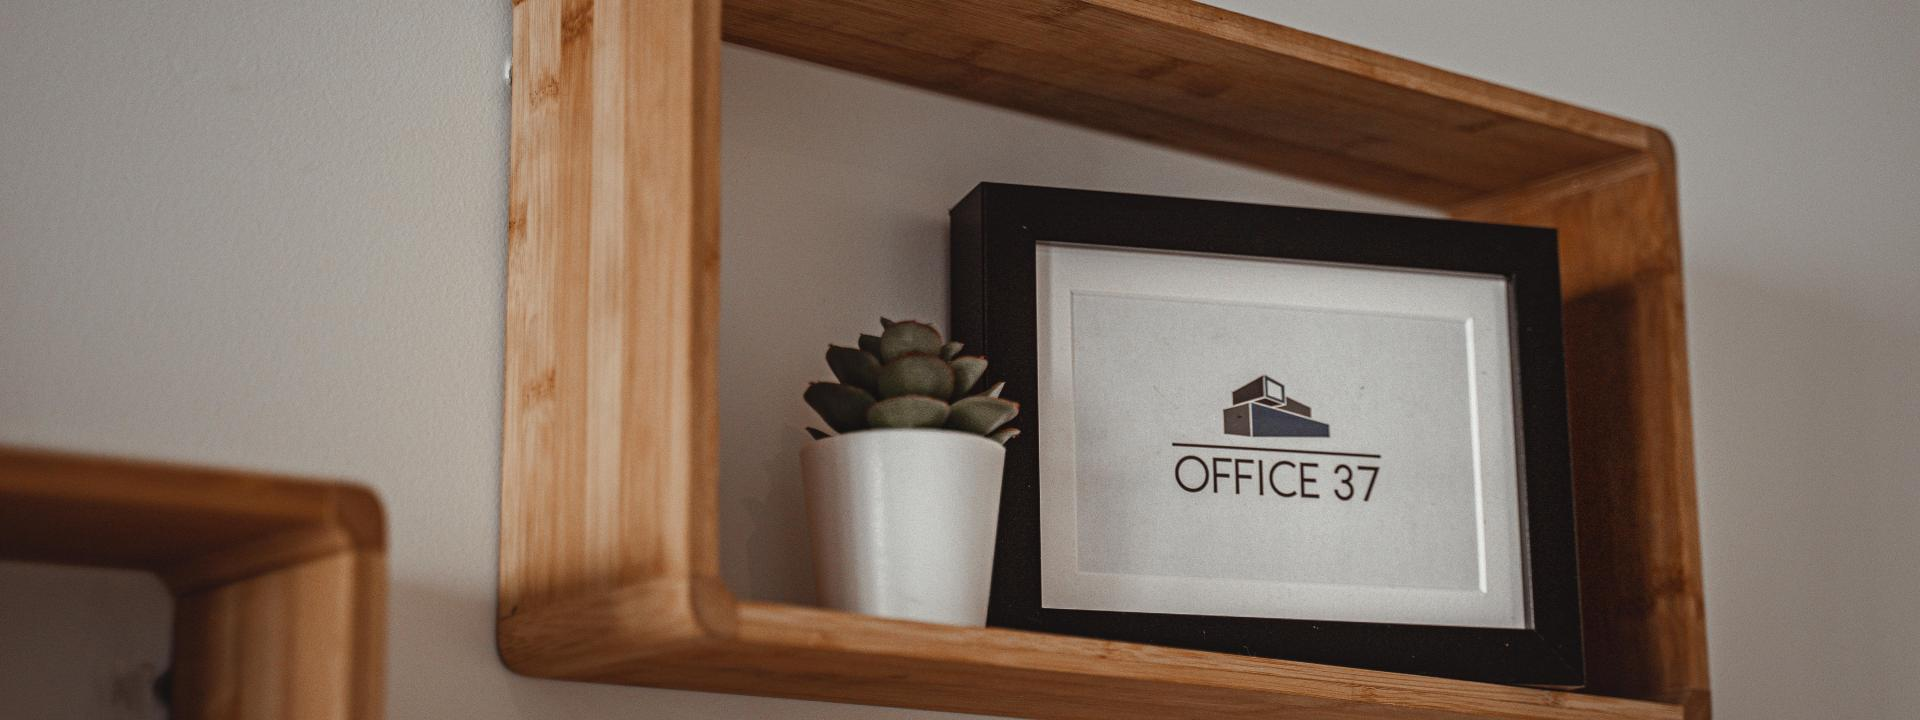 Office 37